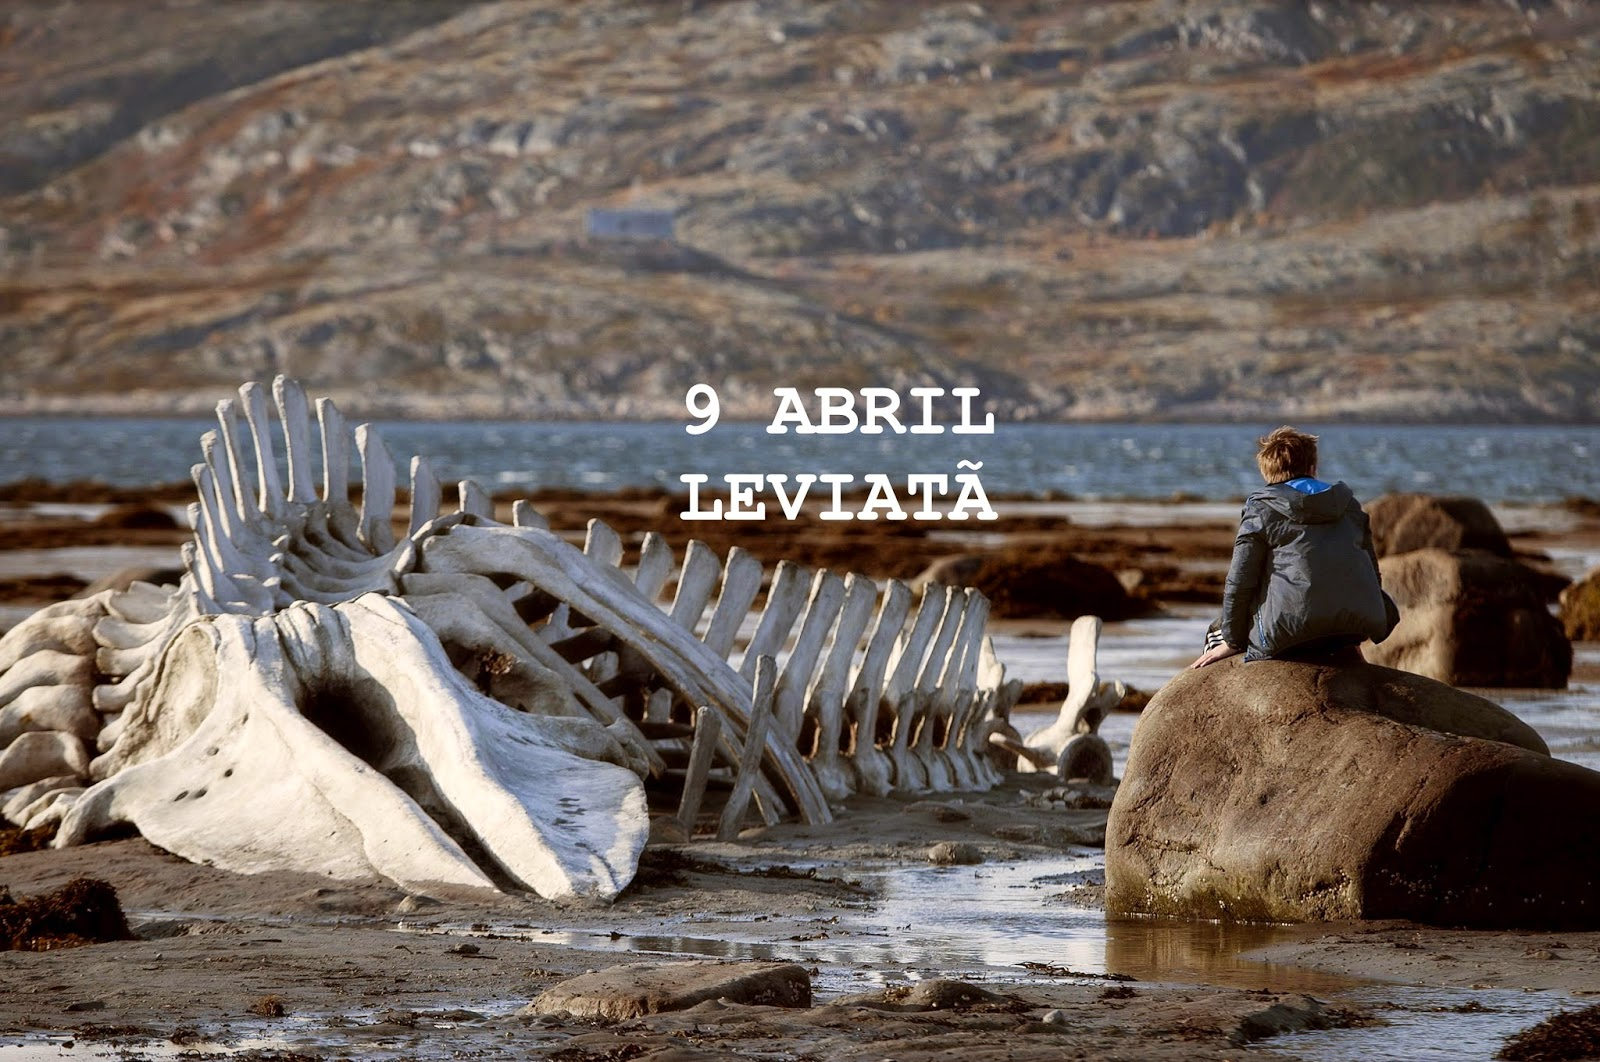 Leviatã - Leviafan